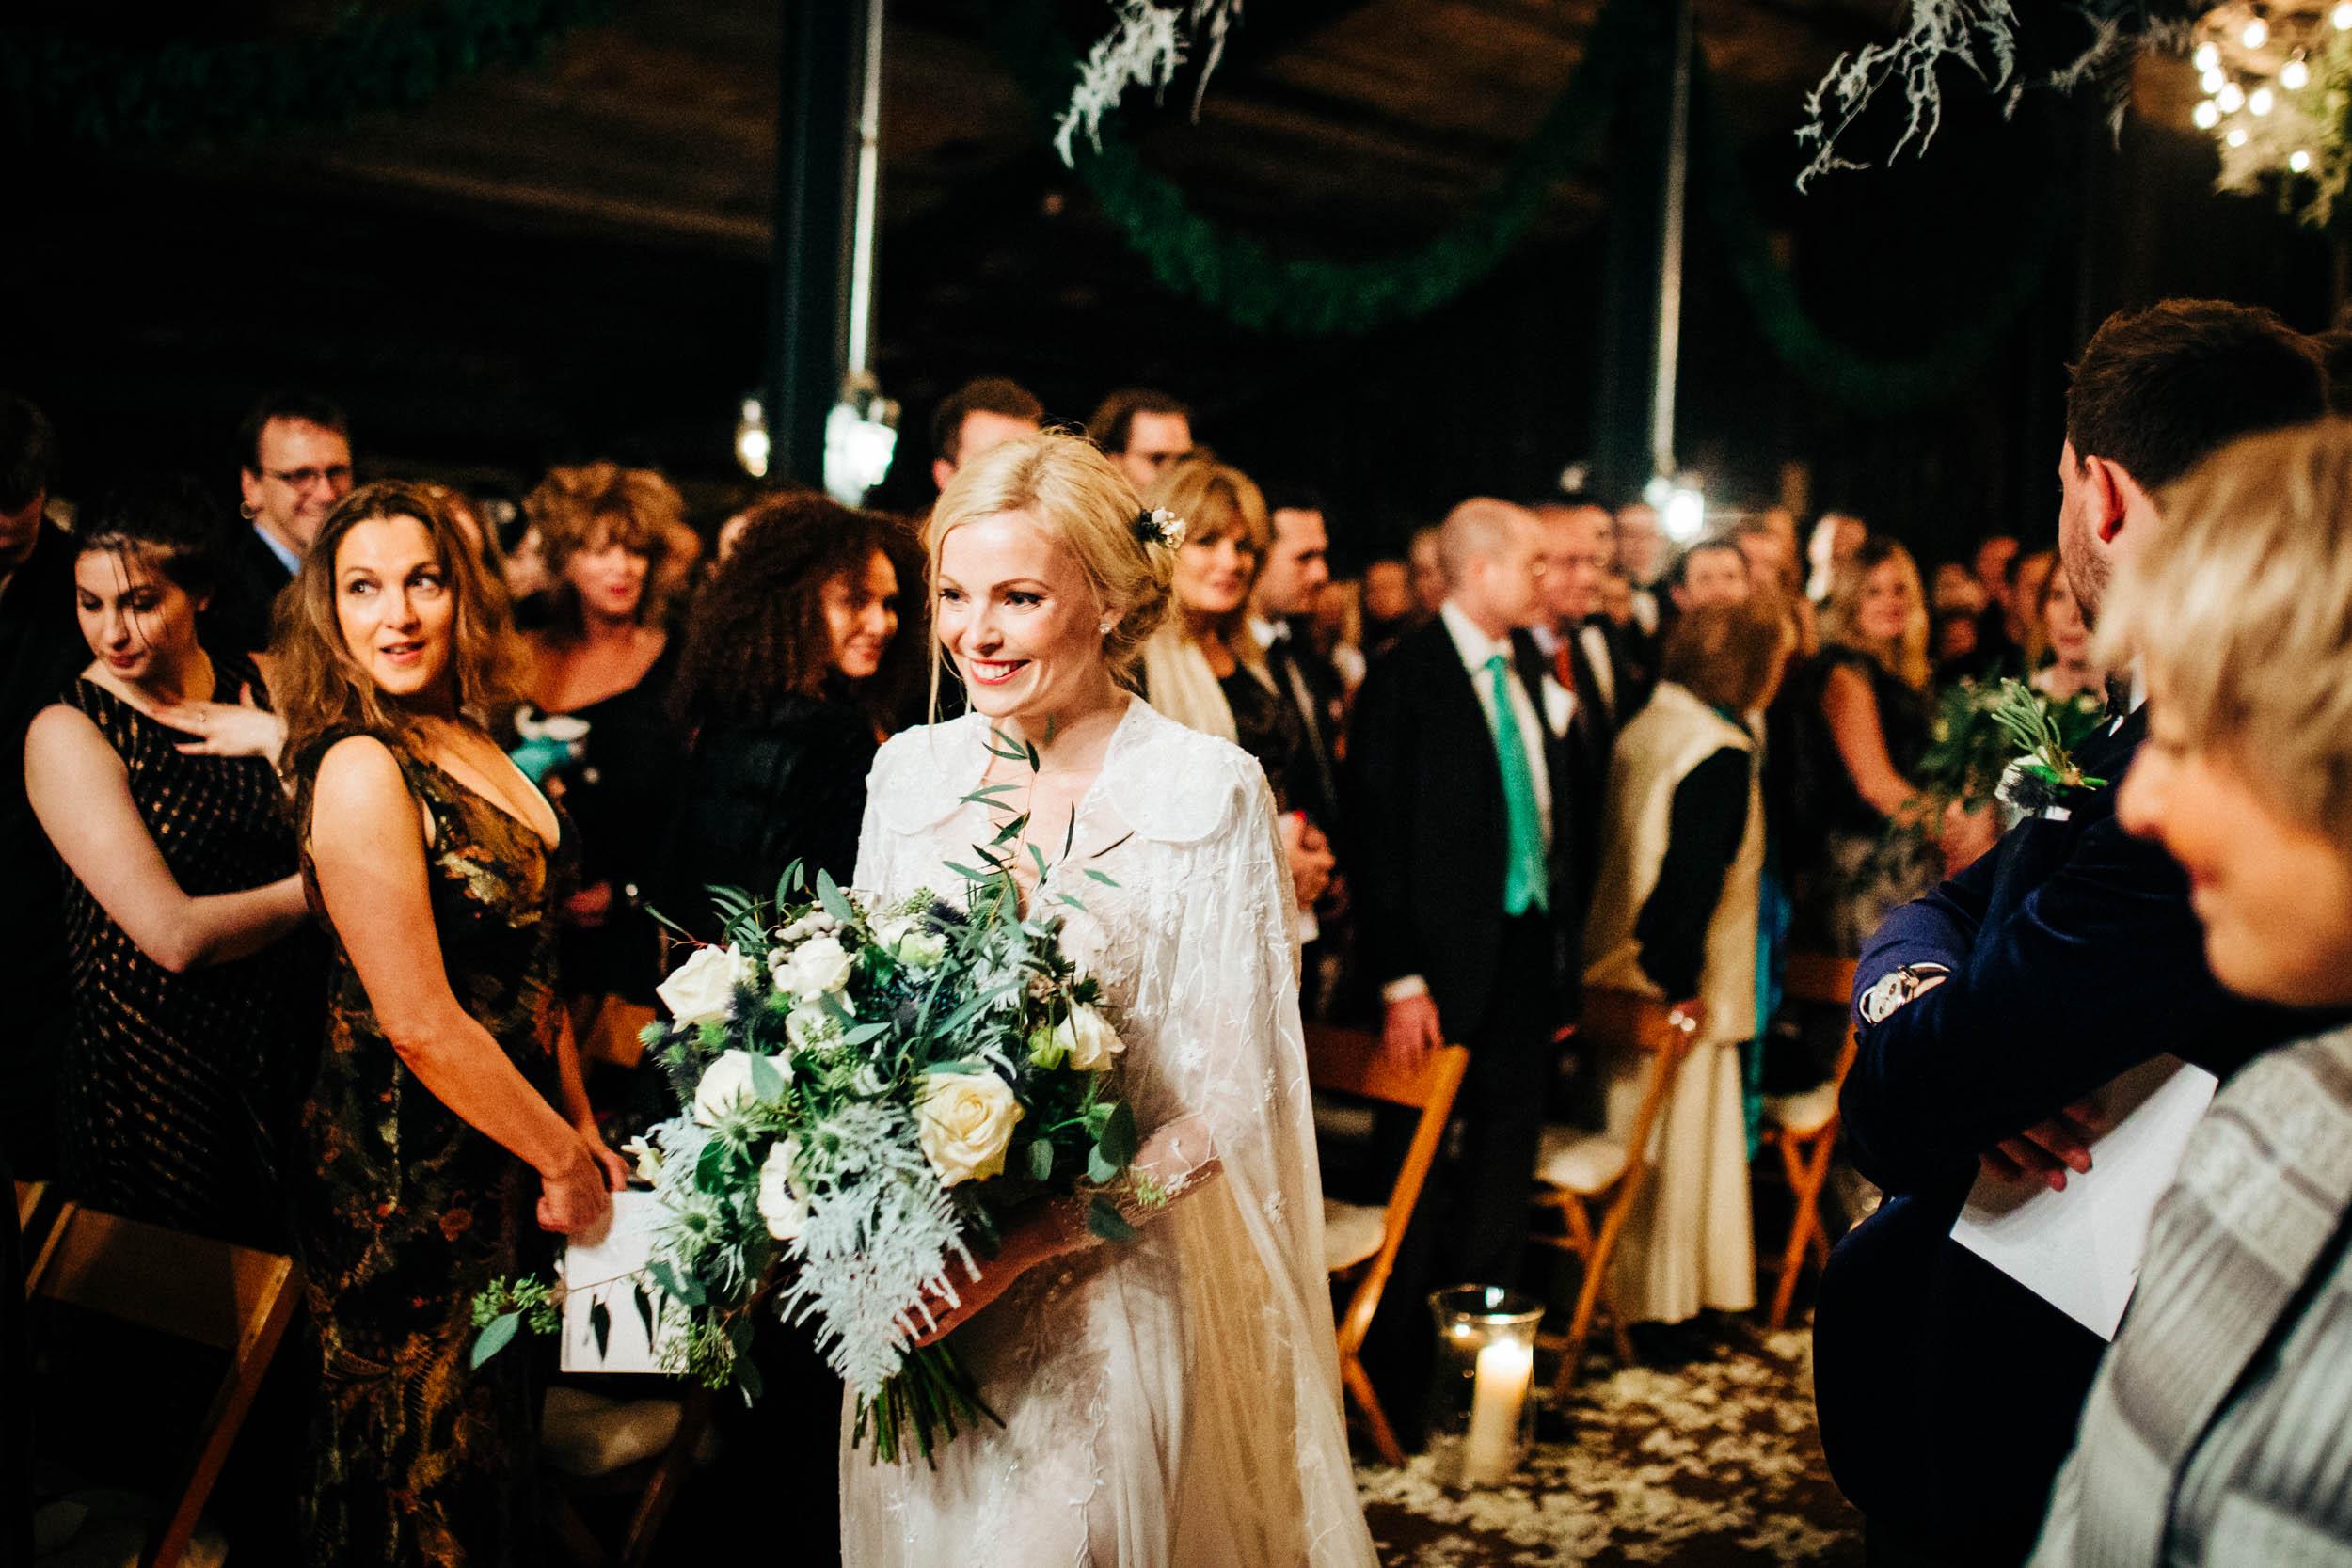 Alex_Sedgmond_Photography-SouthWalesWeddingPhotography-Wedding-Photographer-Cardiff-18.jpg